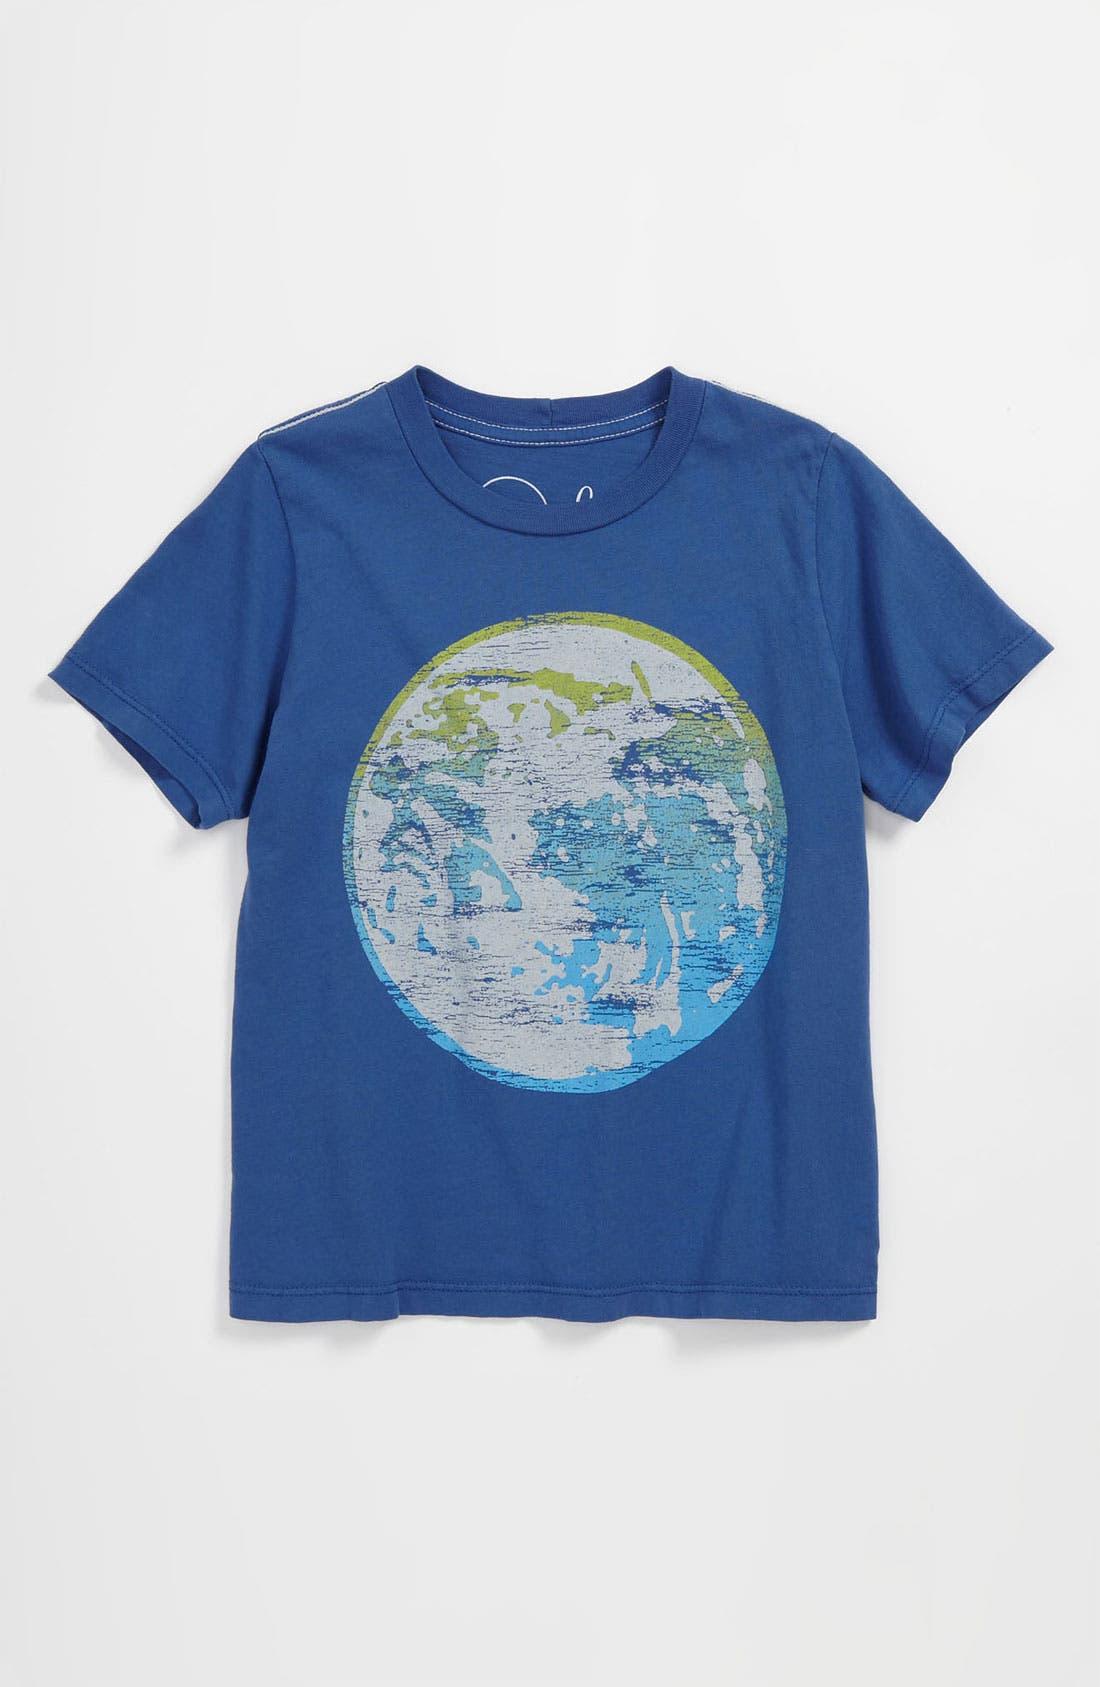 Alternate Image 1 Selected - Peek 'Respect Your Mother' T-Shirt (Toddler, Little Boys & Big Boys)